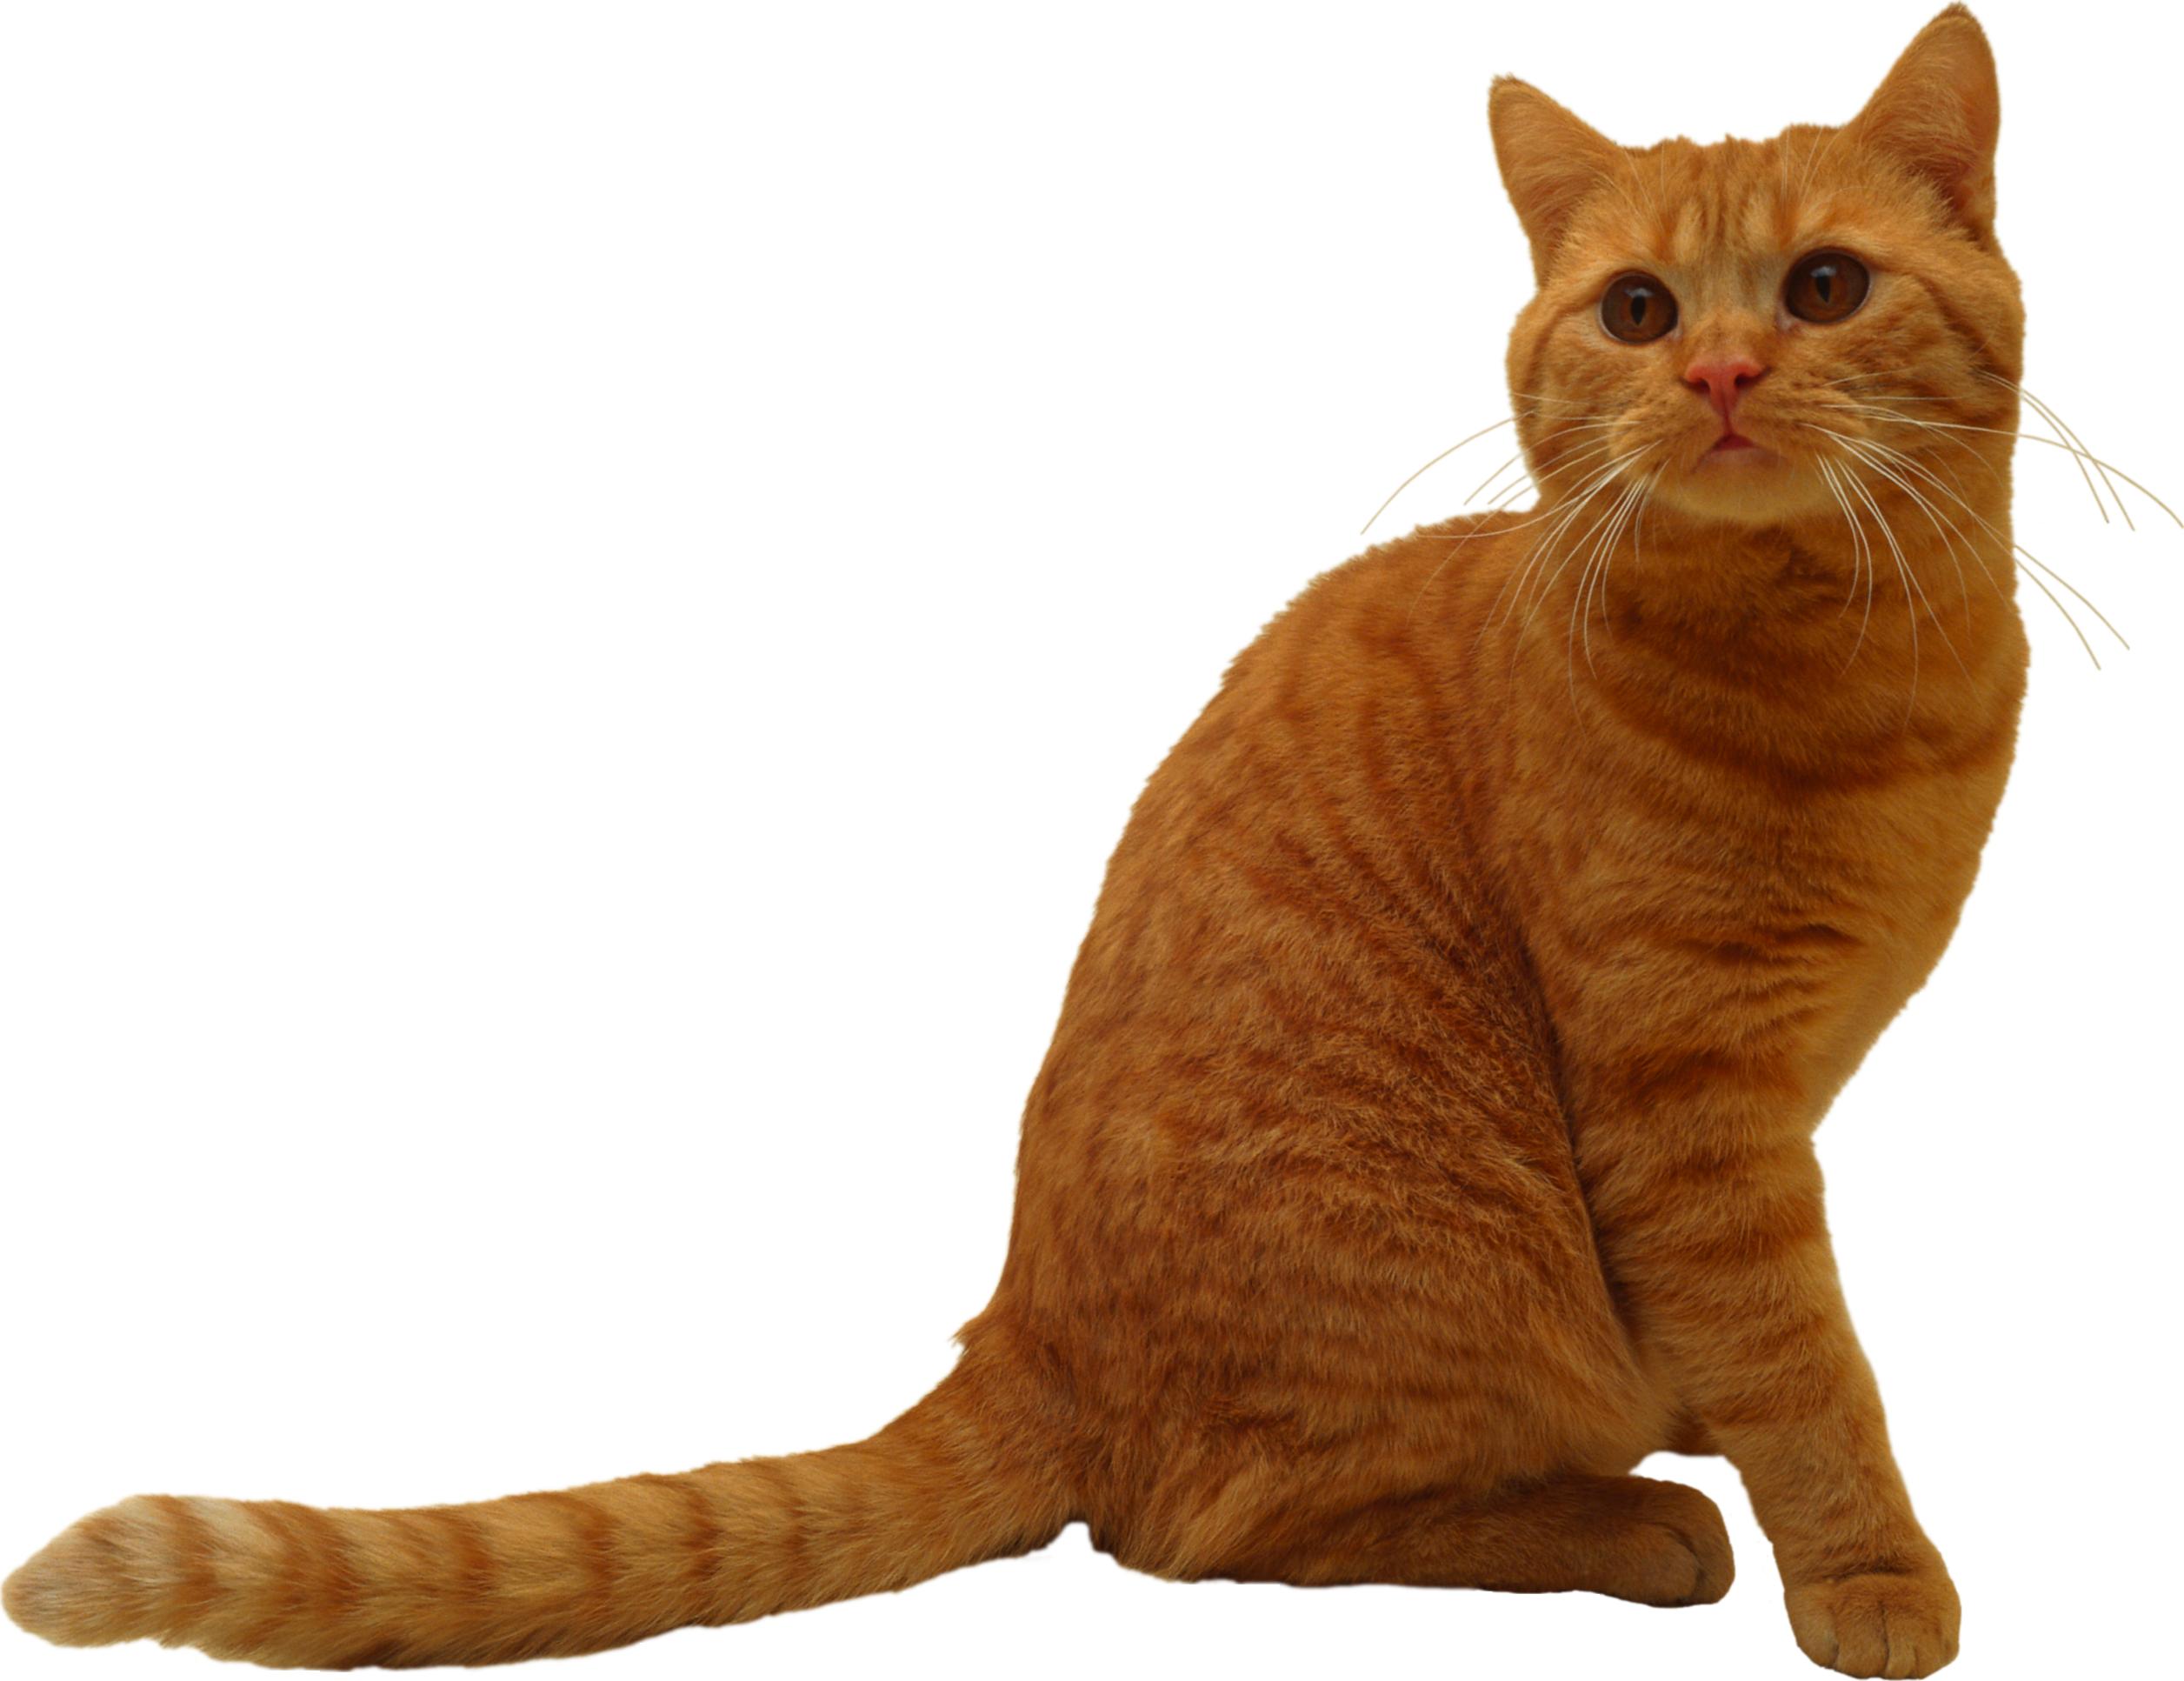 Sitting Cat PNG Image - PurePNG | Free transparent CC0 PNG ...